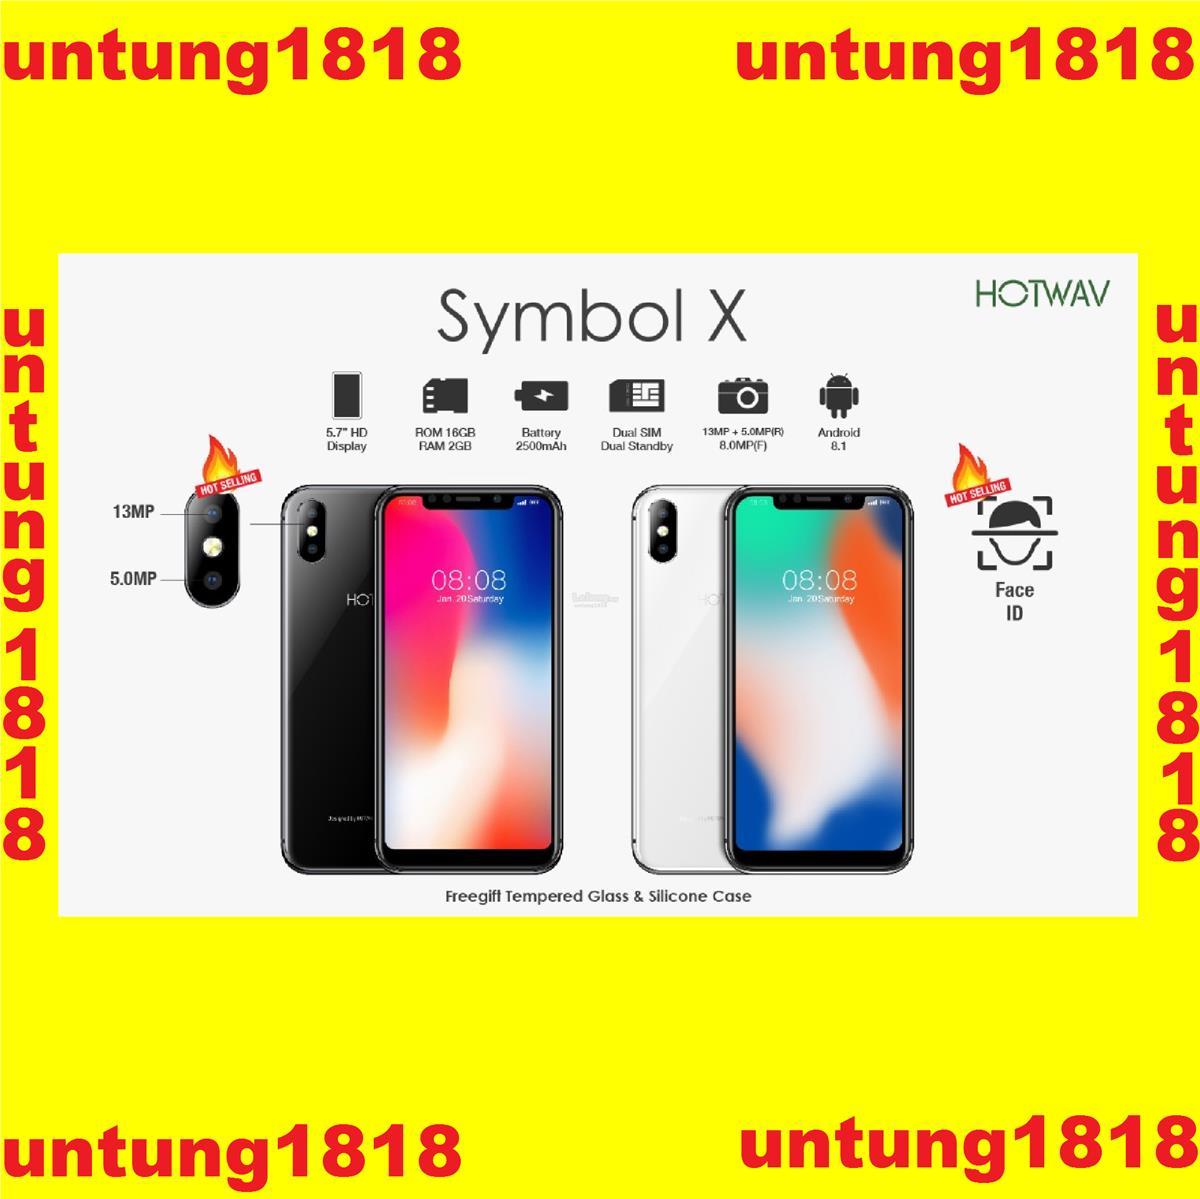 ORIGINAL_HOTWAV Symbol X 5 7 inch Android Smartphone